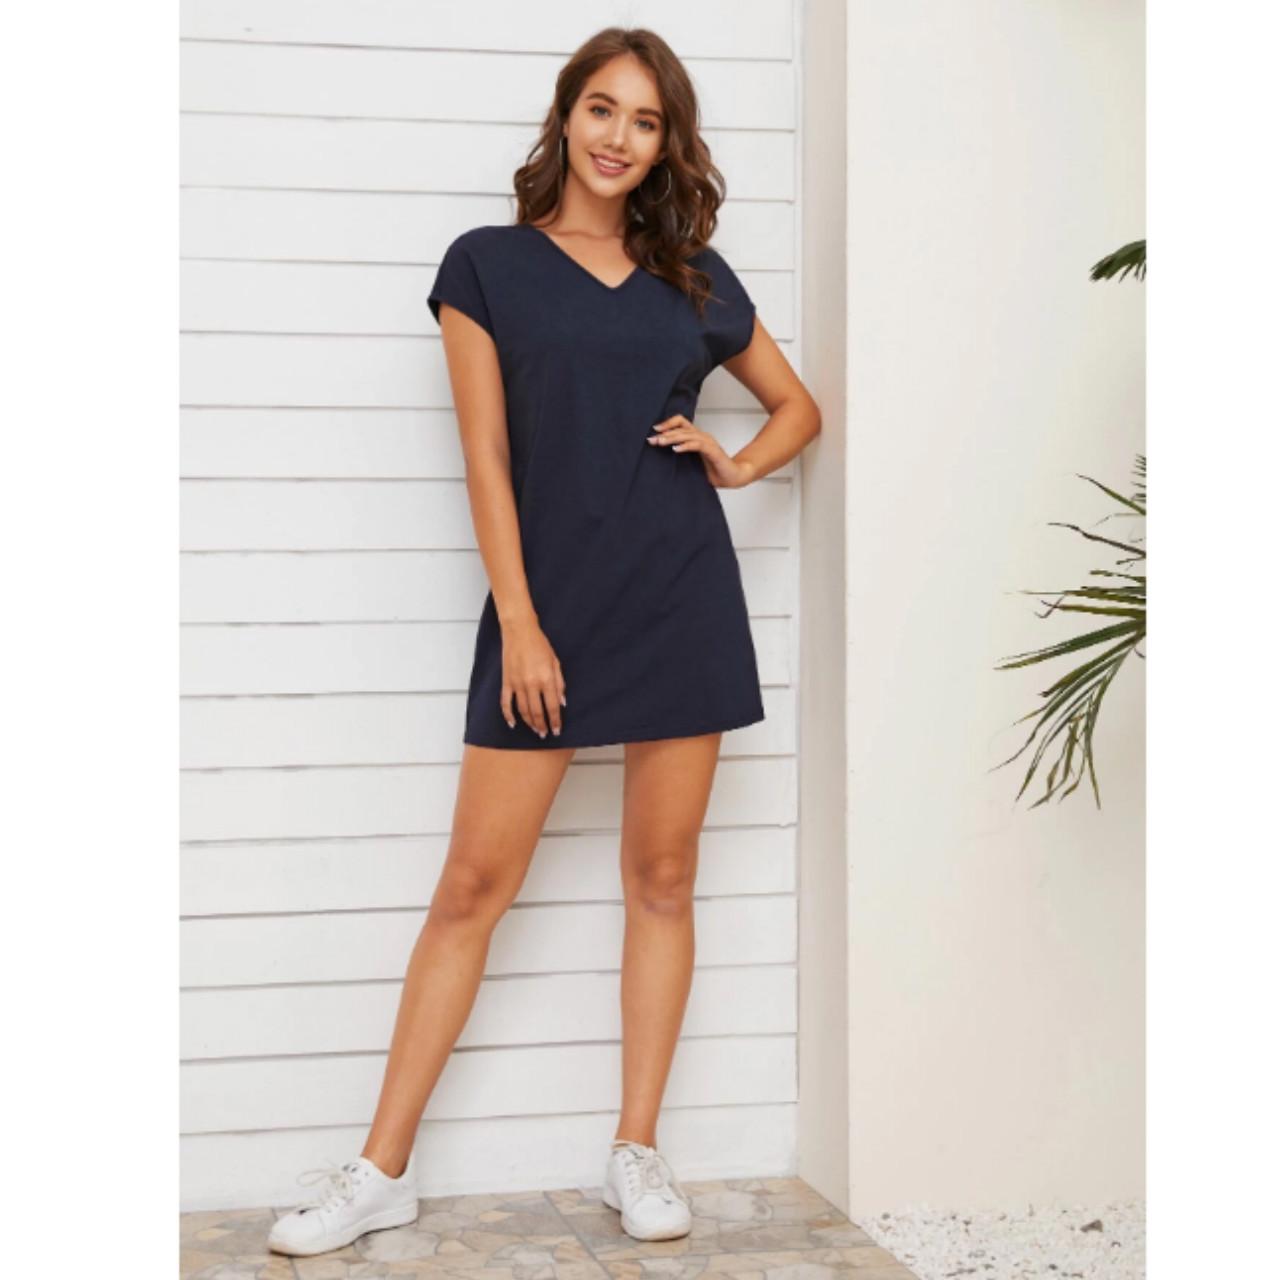 V-neck batwing sleeve solid dress xl